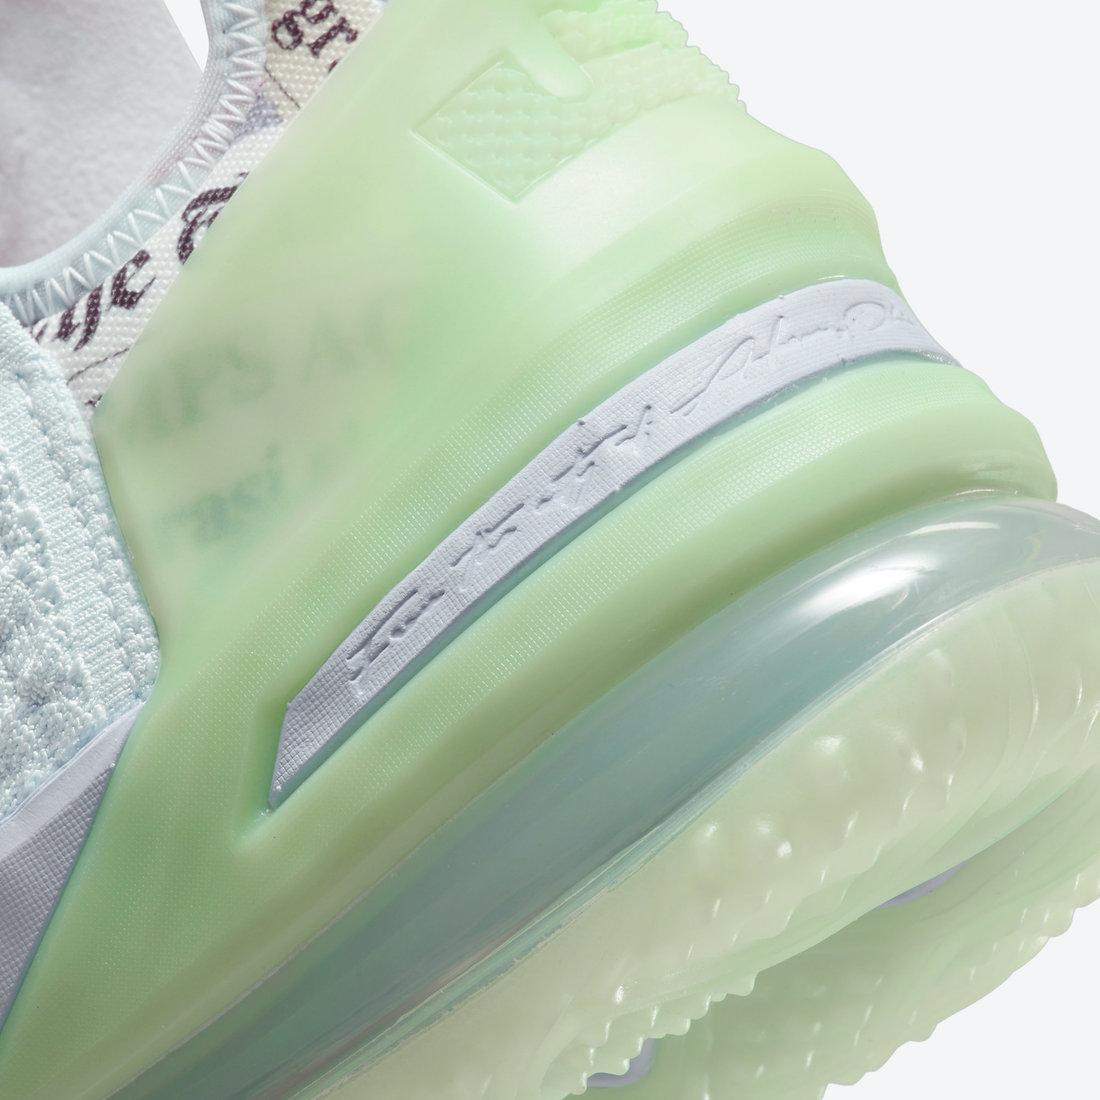 Diana Taurasi Nike LeBron 18 Goat CQ9283-401 Release Date Info